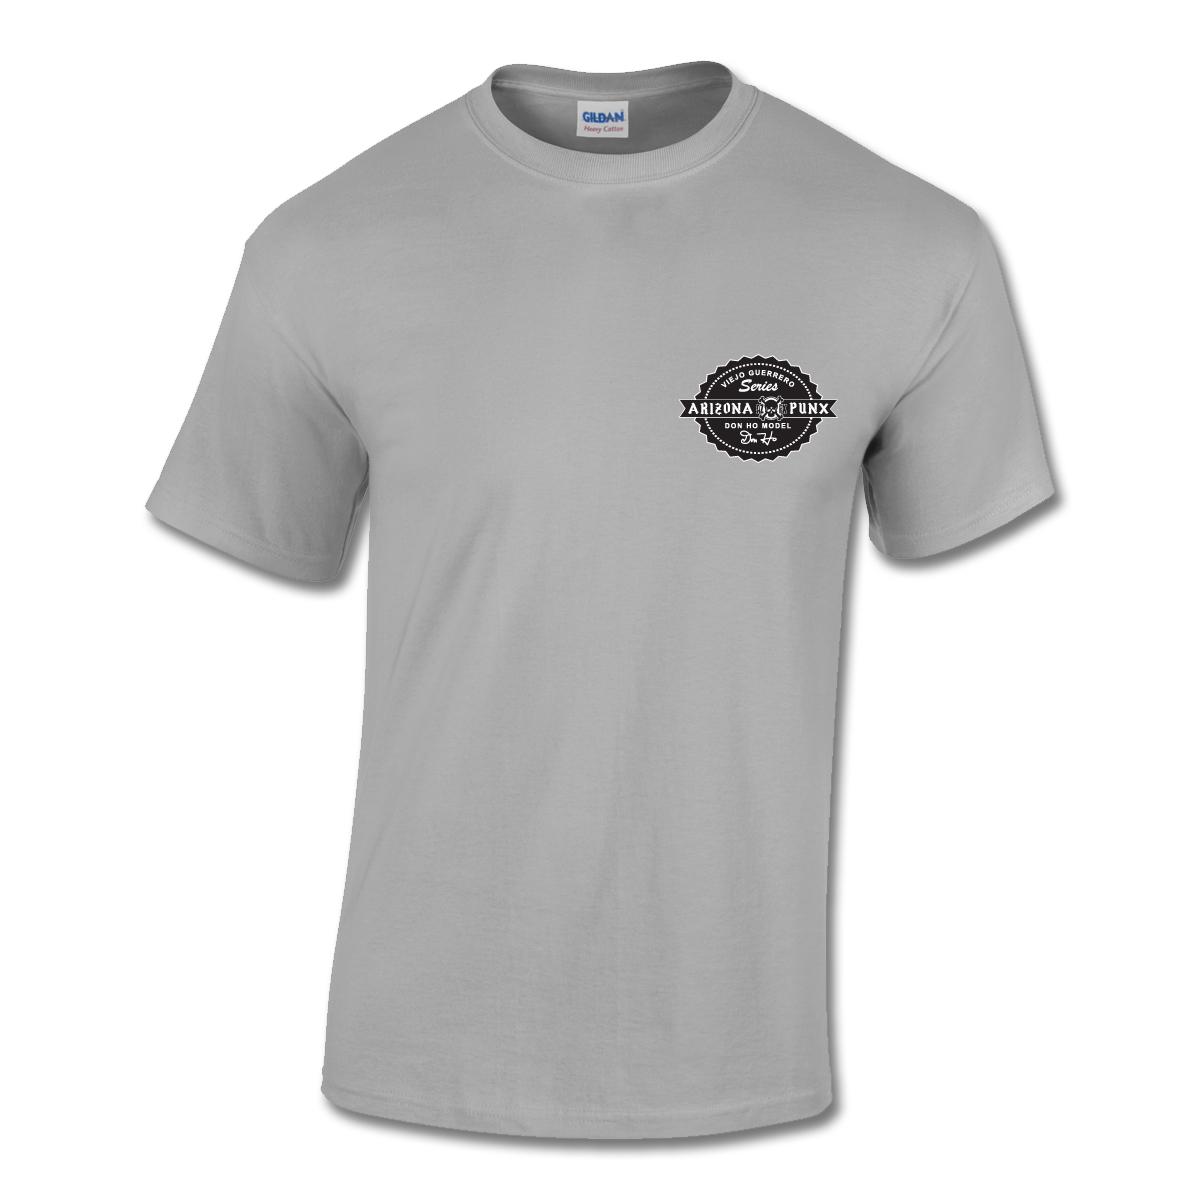 85ab8cffb Don Ho Viejo Guerrero Graphic T-shirt Gravel Grey – A Z P X